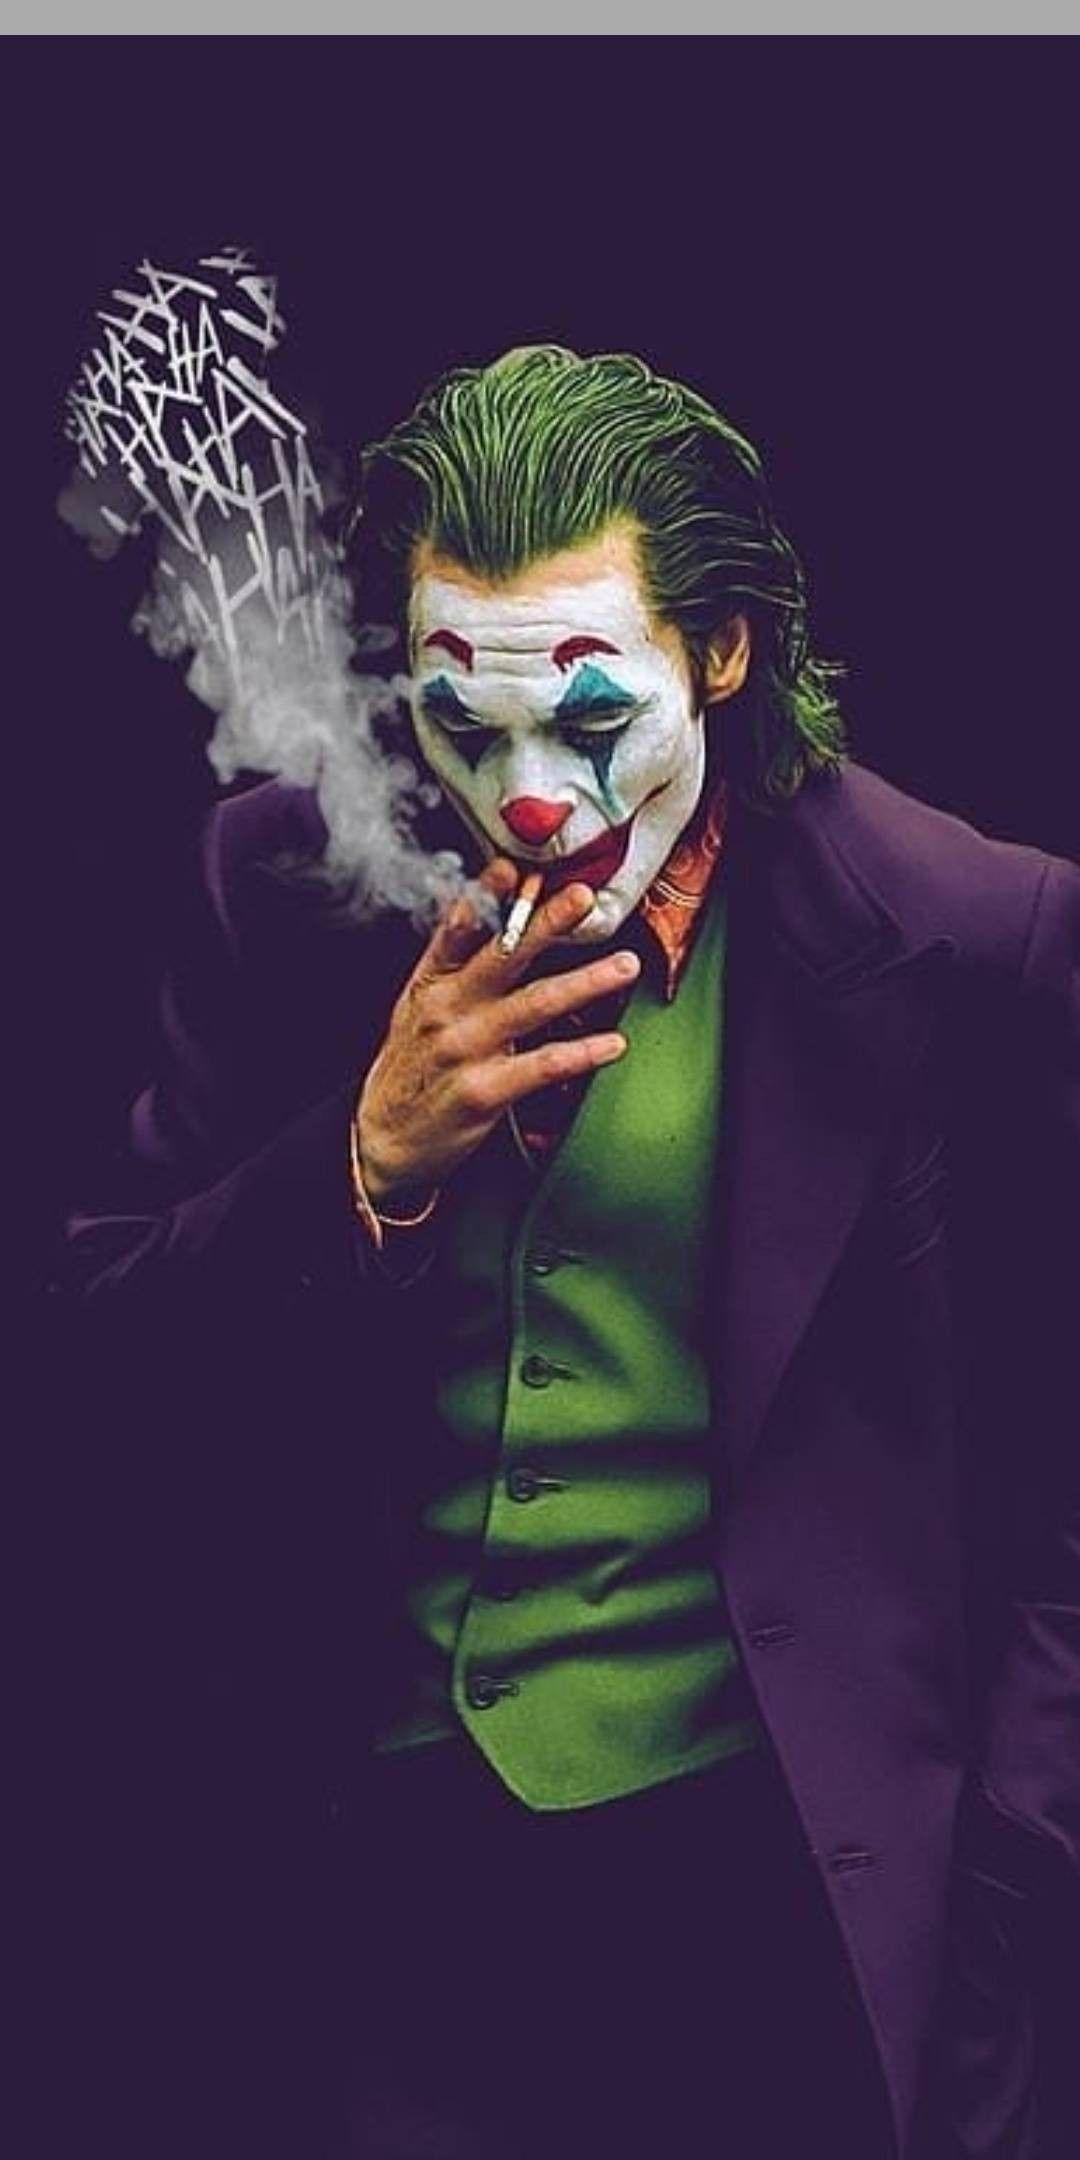 Pin by Bro's Gaming on Wallpaper's Joker wallpapers